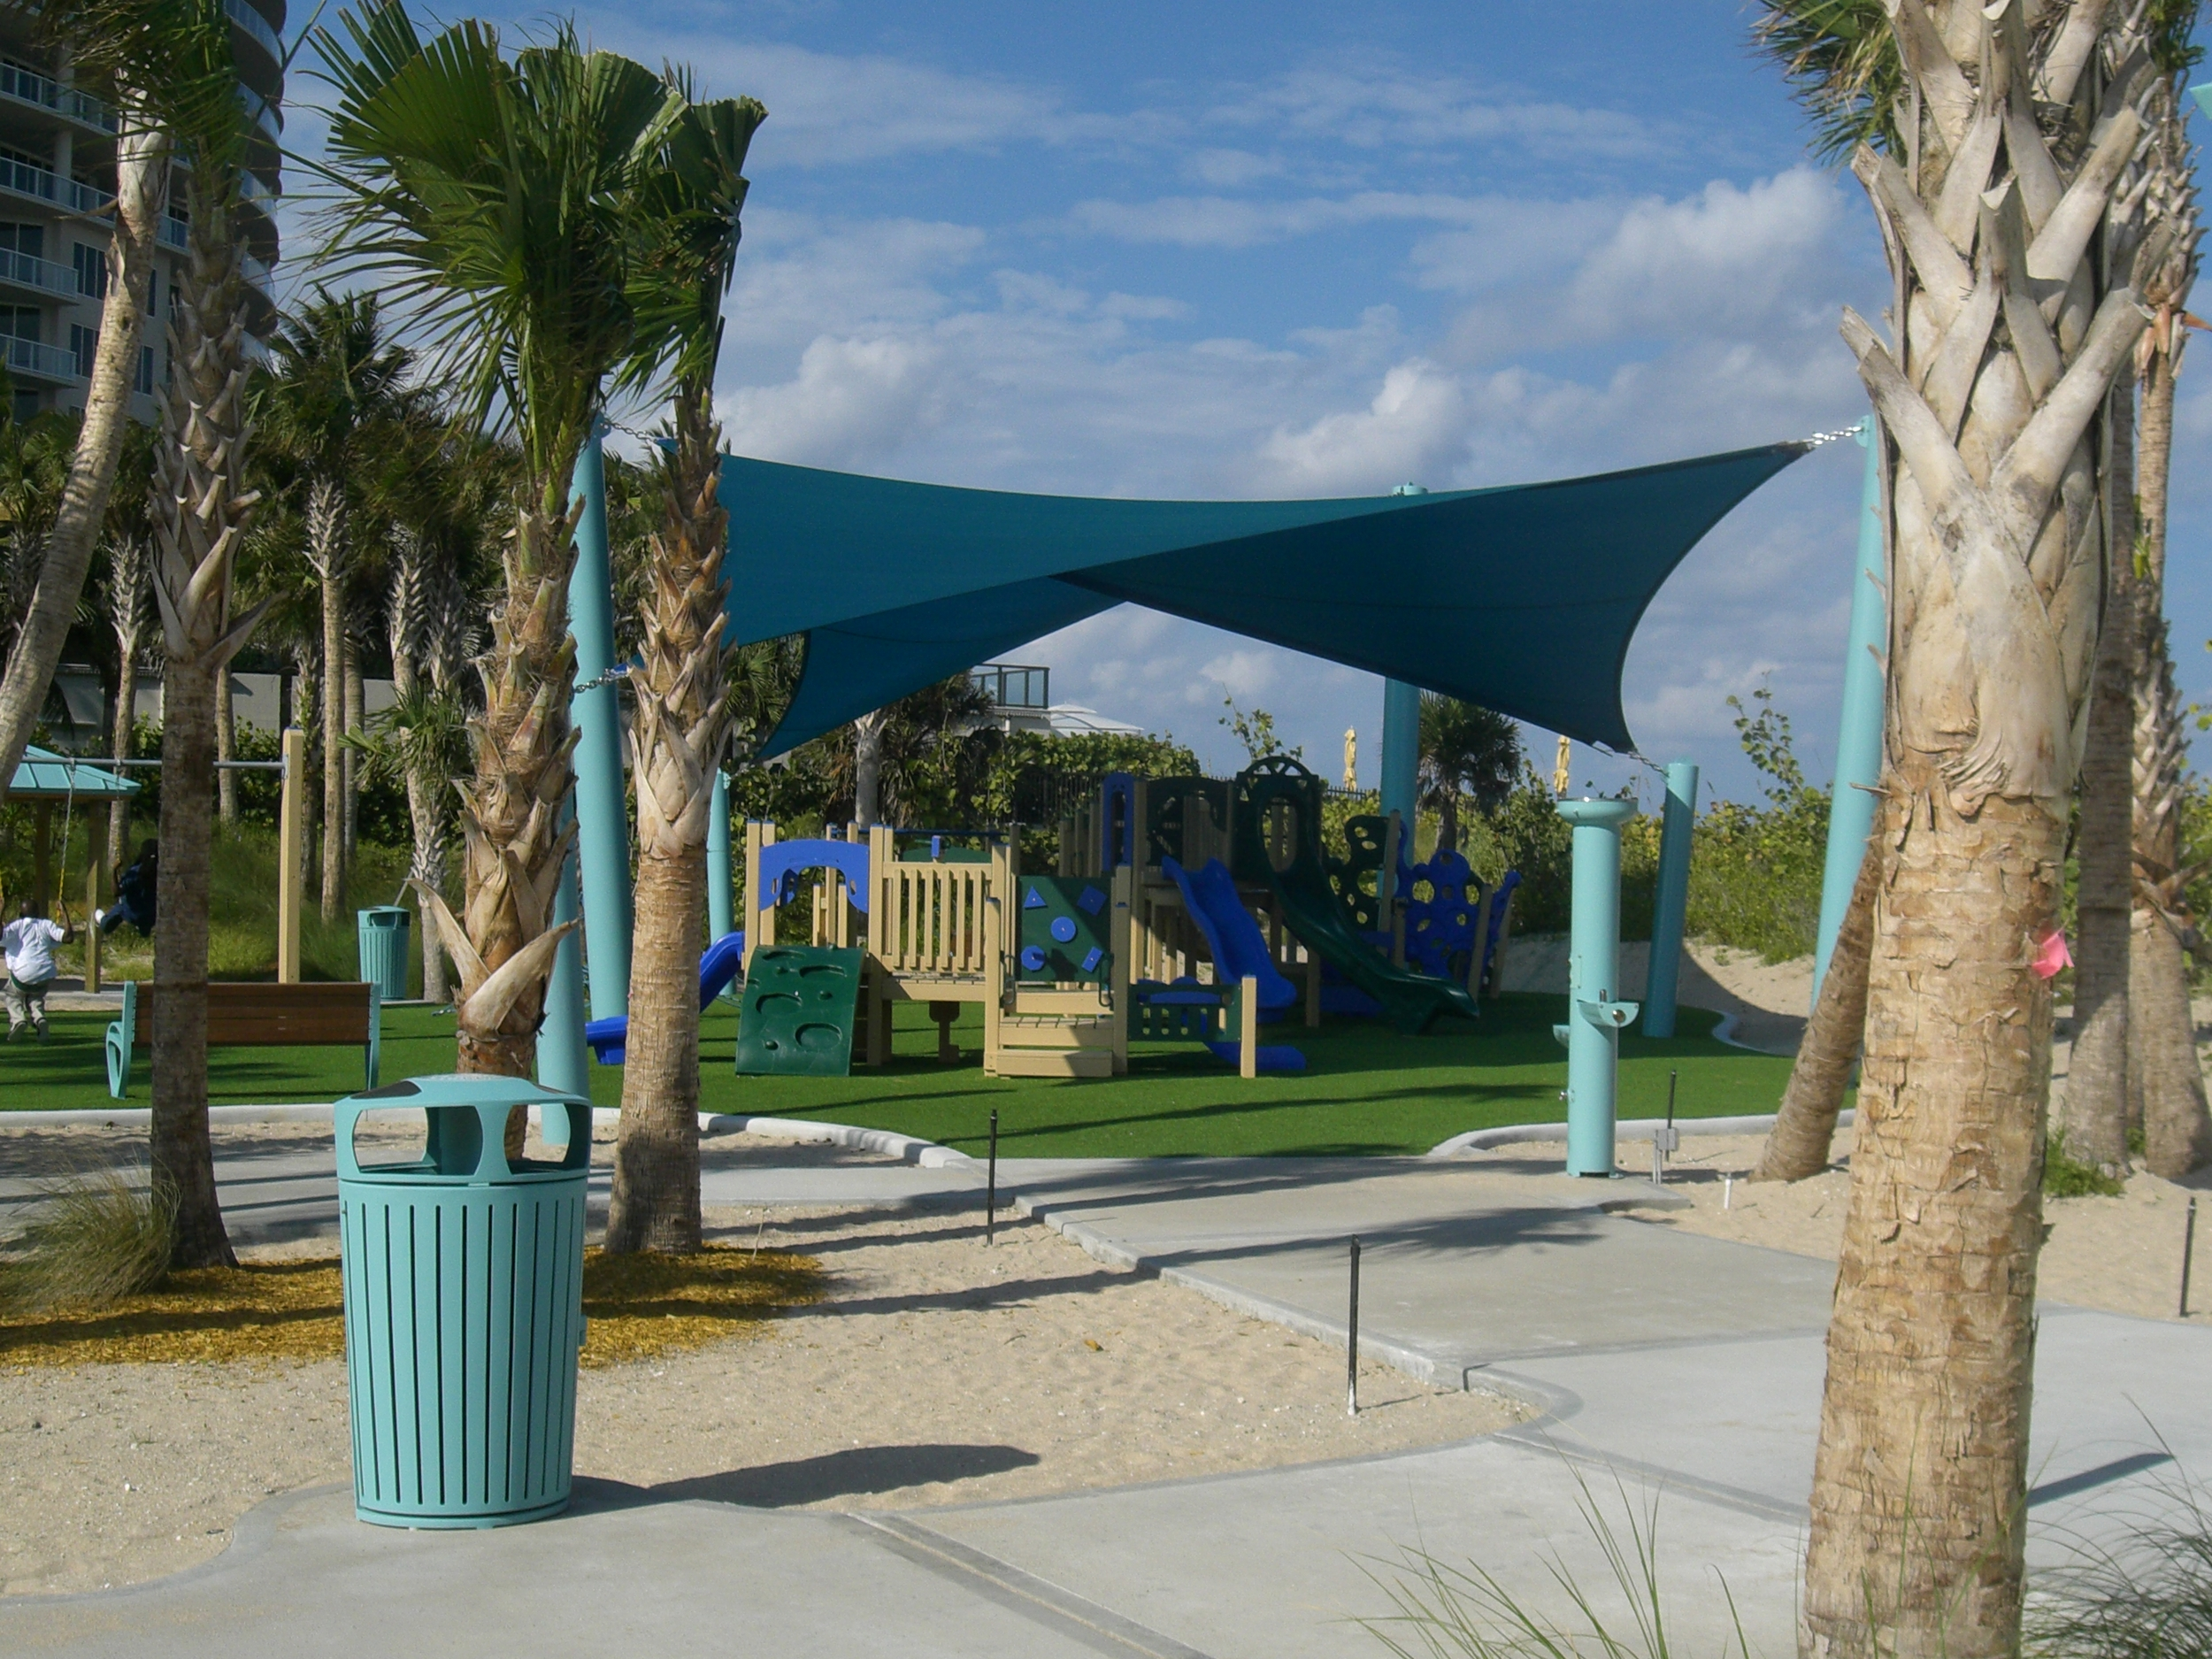 City of Riviera Beach Municipal Beach Park Ocean Mall Shade Sail over Playground.JPG